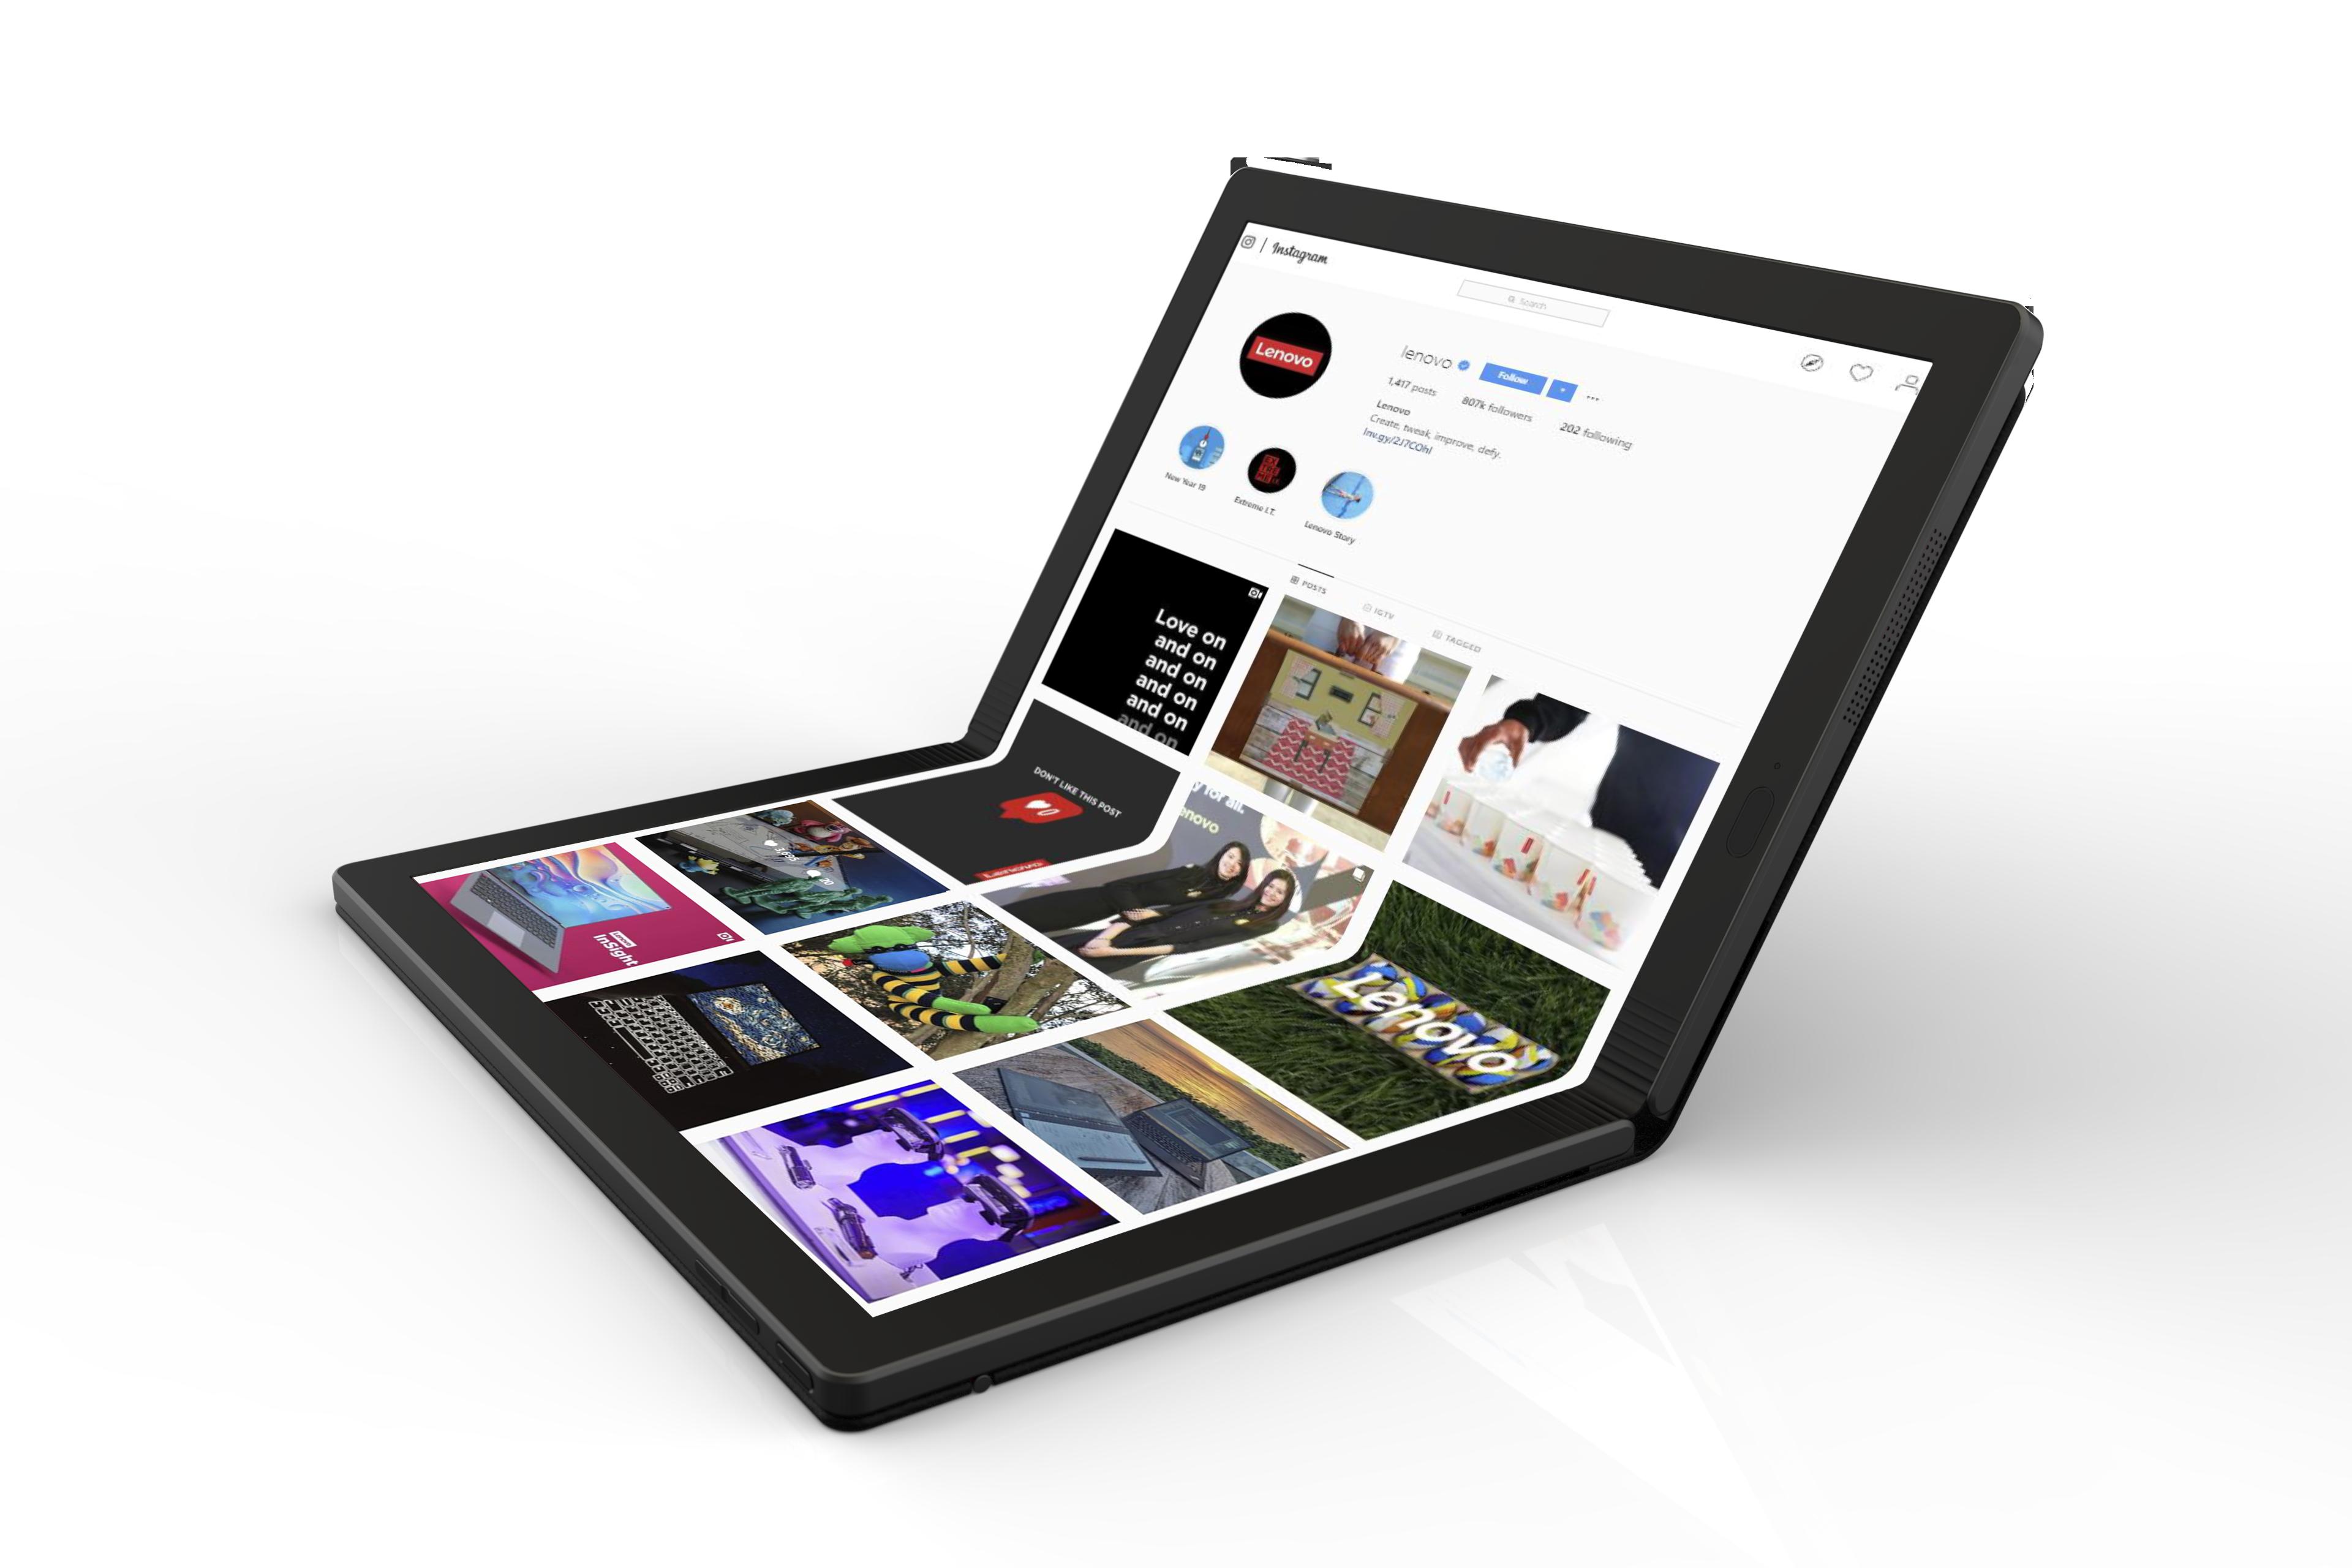 Lenovo patents two foldable Windows 10 PCs, aims to address two